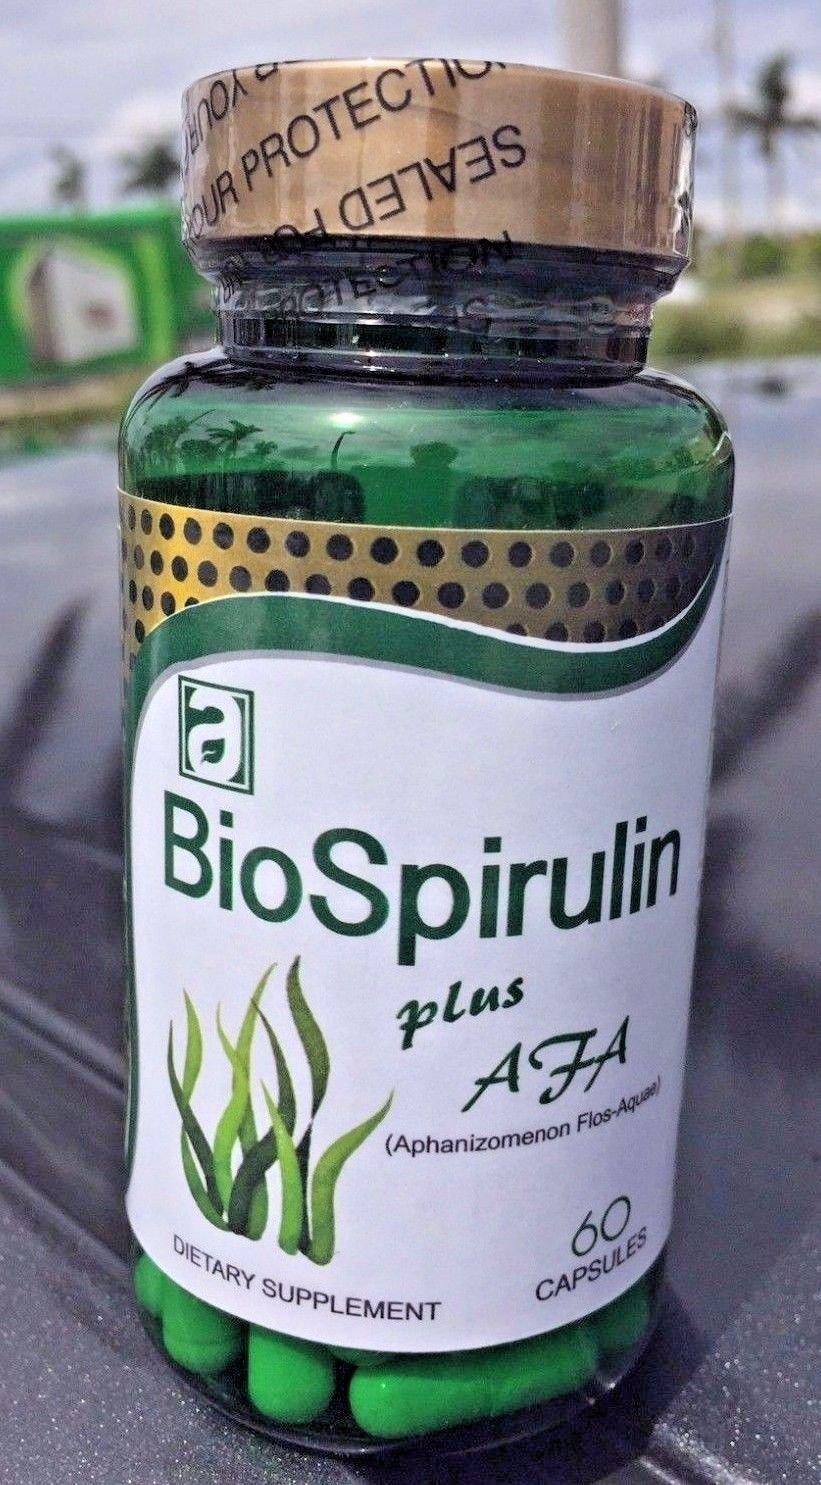 Amazon.com: BioSpirulin Plus AFA (Aphaminozen Flos - Aquae) Dietary ...